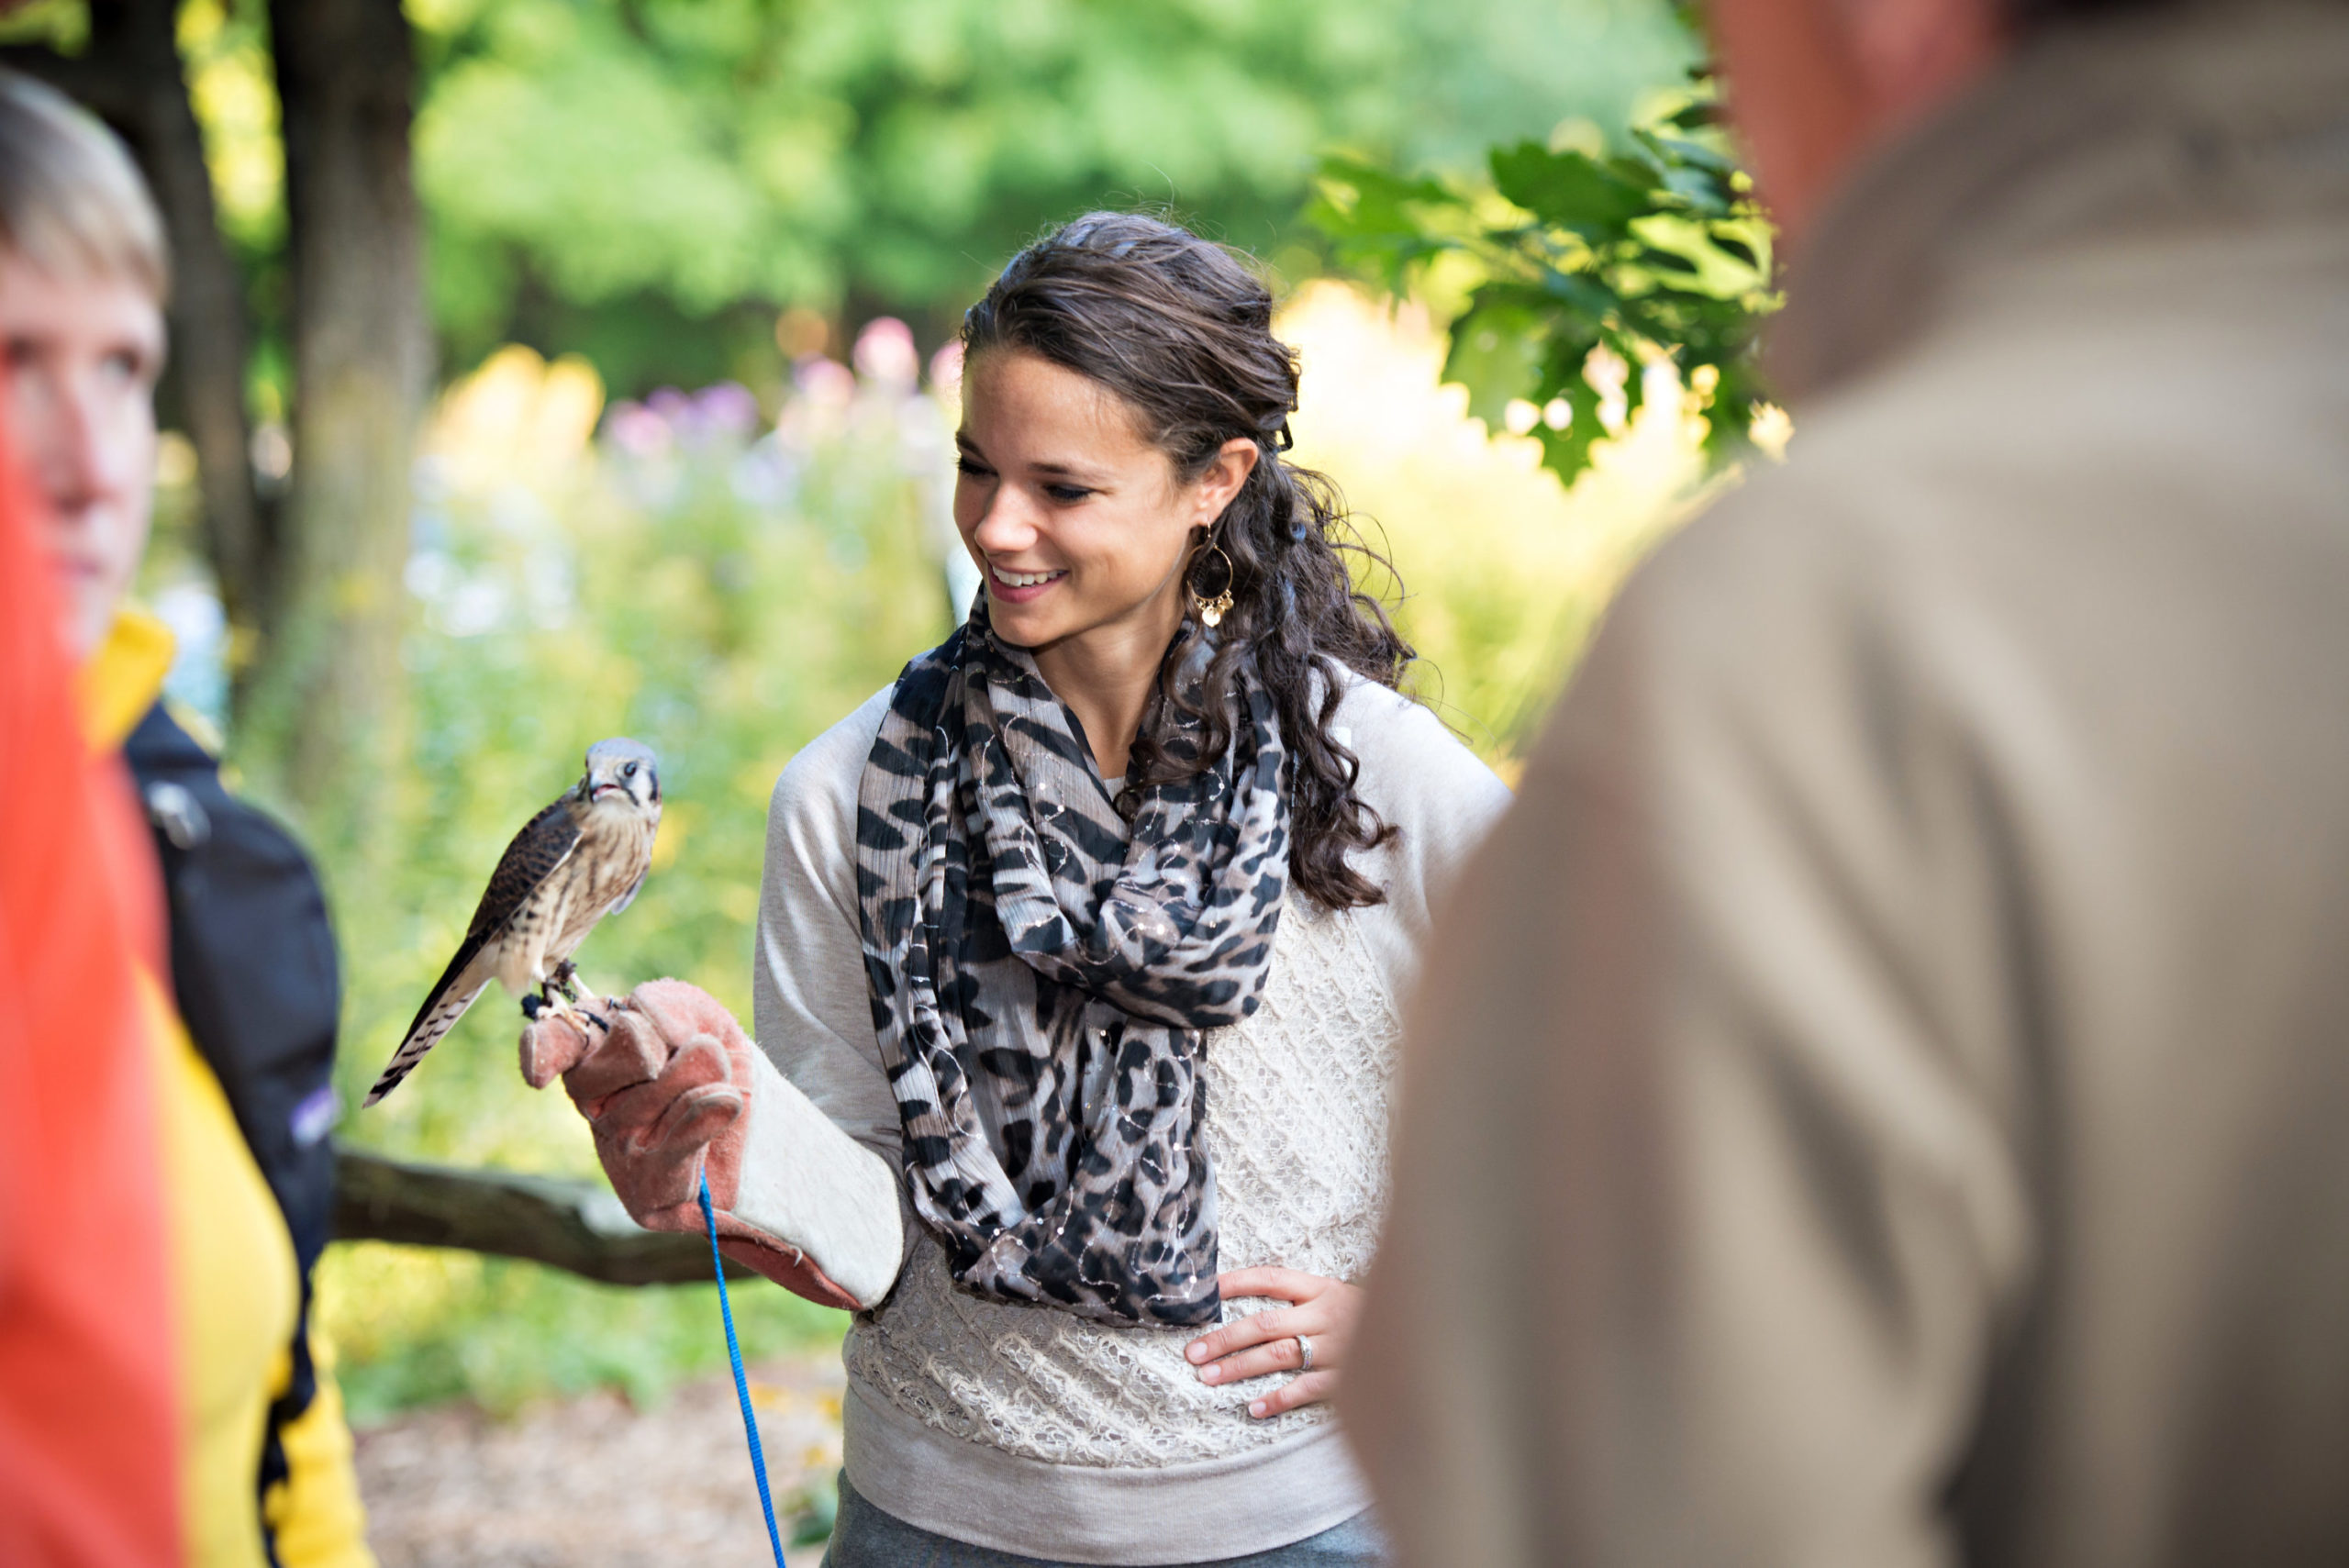 Showing the wildlife ambassador